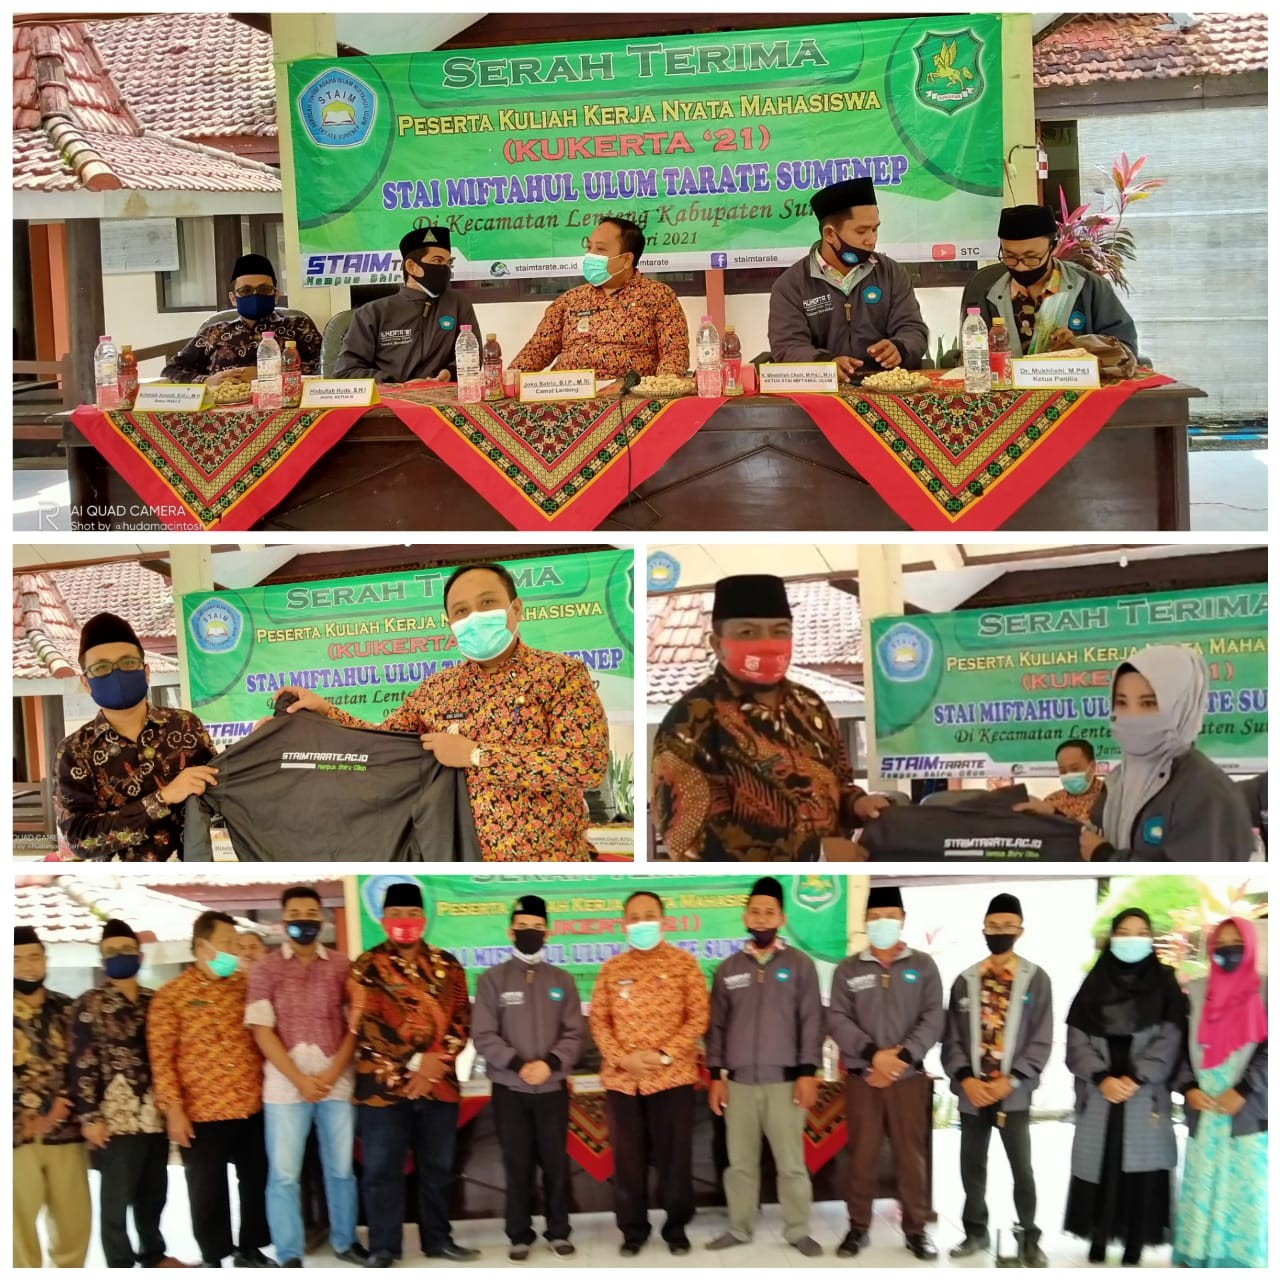 STAIM Tarate Sumenep Lakukan Serah Terima Peserta Kukerta 2021 di Kecamatan Lenteng